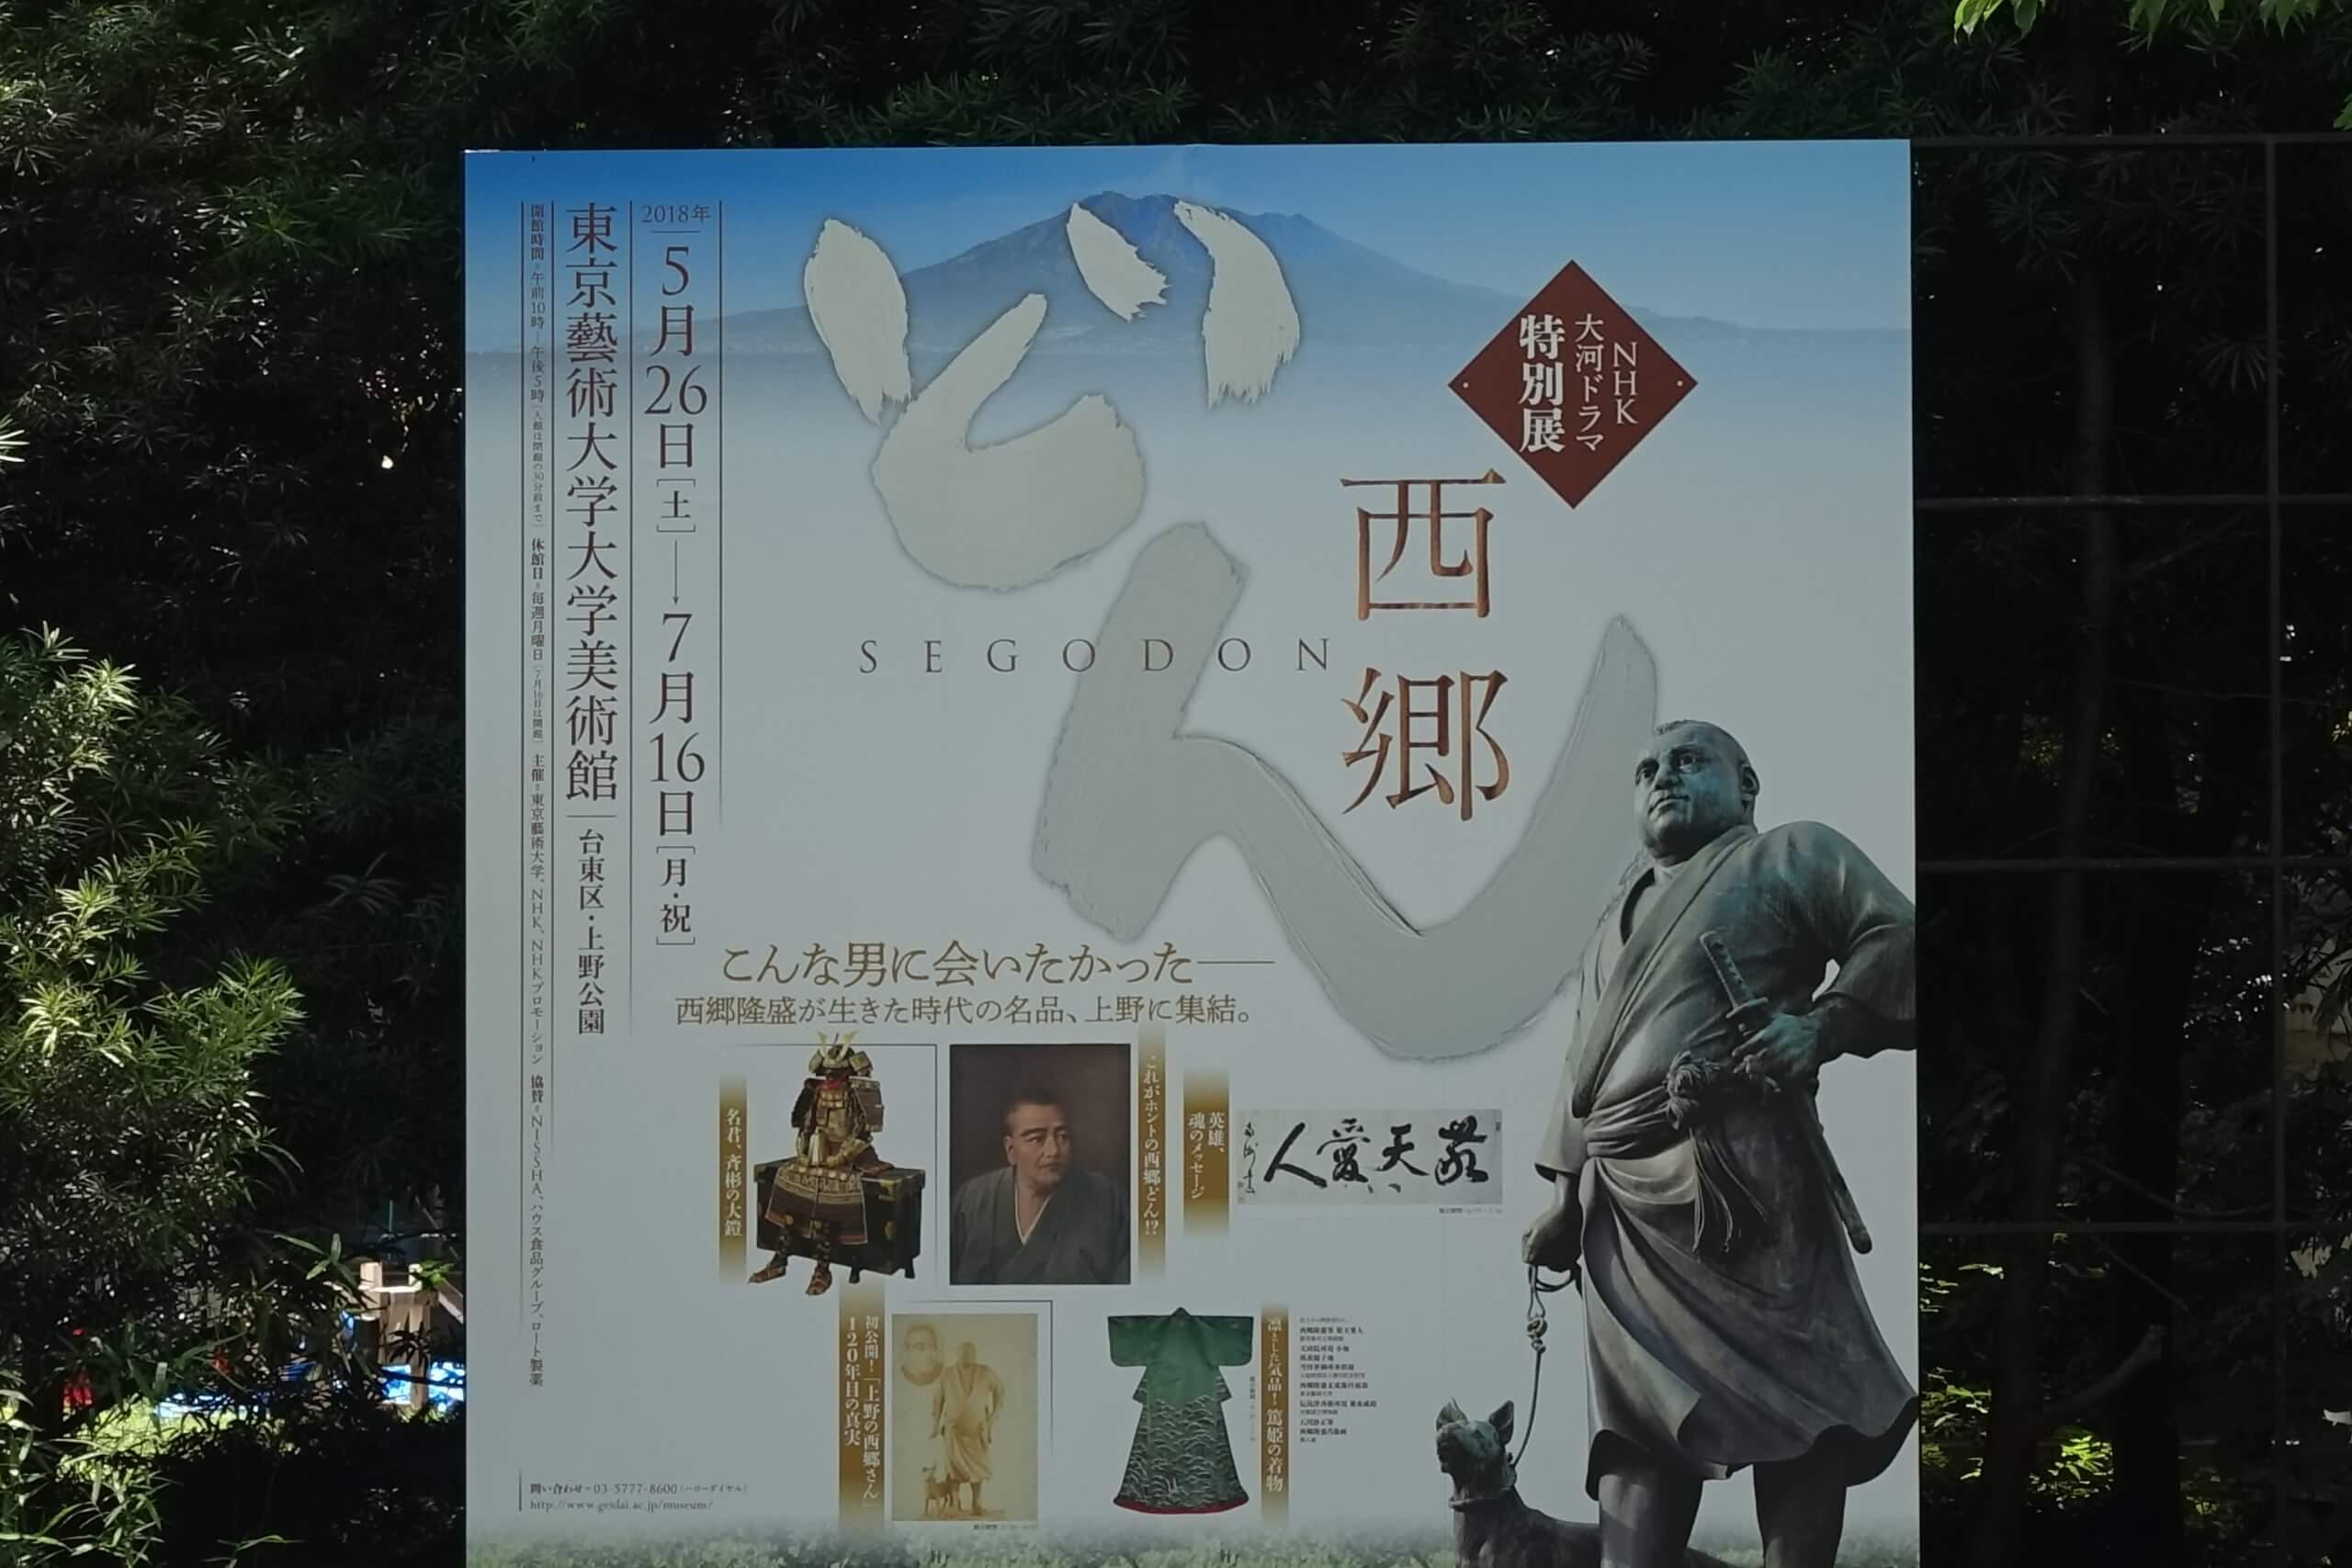 NHK大河ドラマ特別展「西郷どん」@東京藝術大学美術館